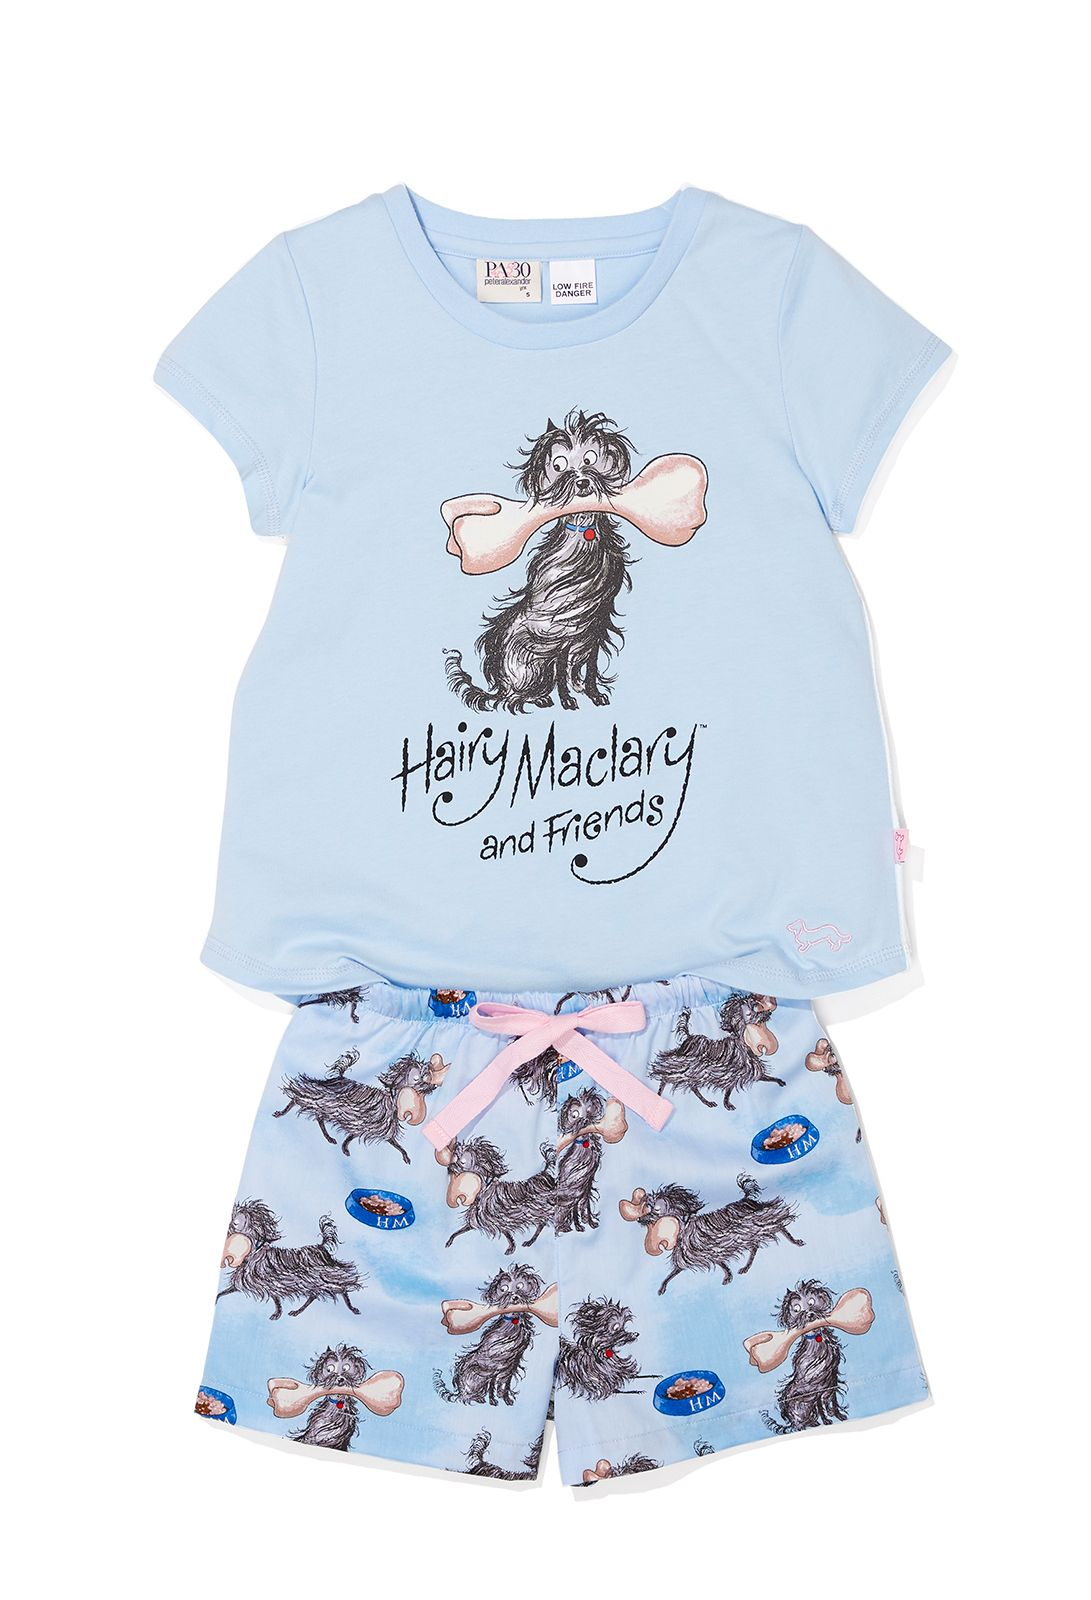 5ccfac68c8c9 Peter Alexander Hairy Maclary Jnr. Girl's and Boys Sleepwear Set ...